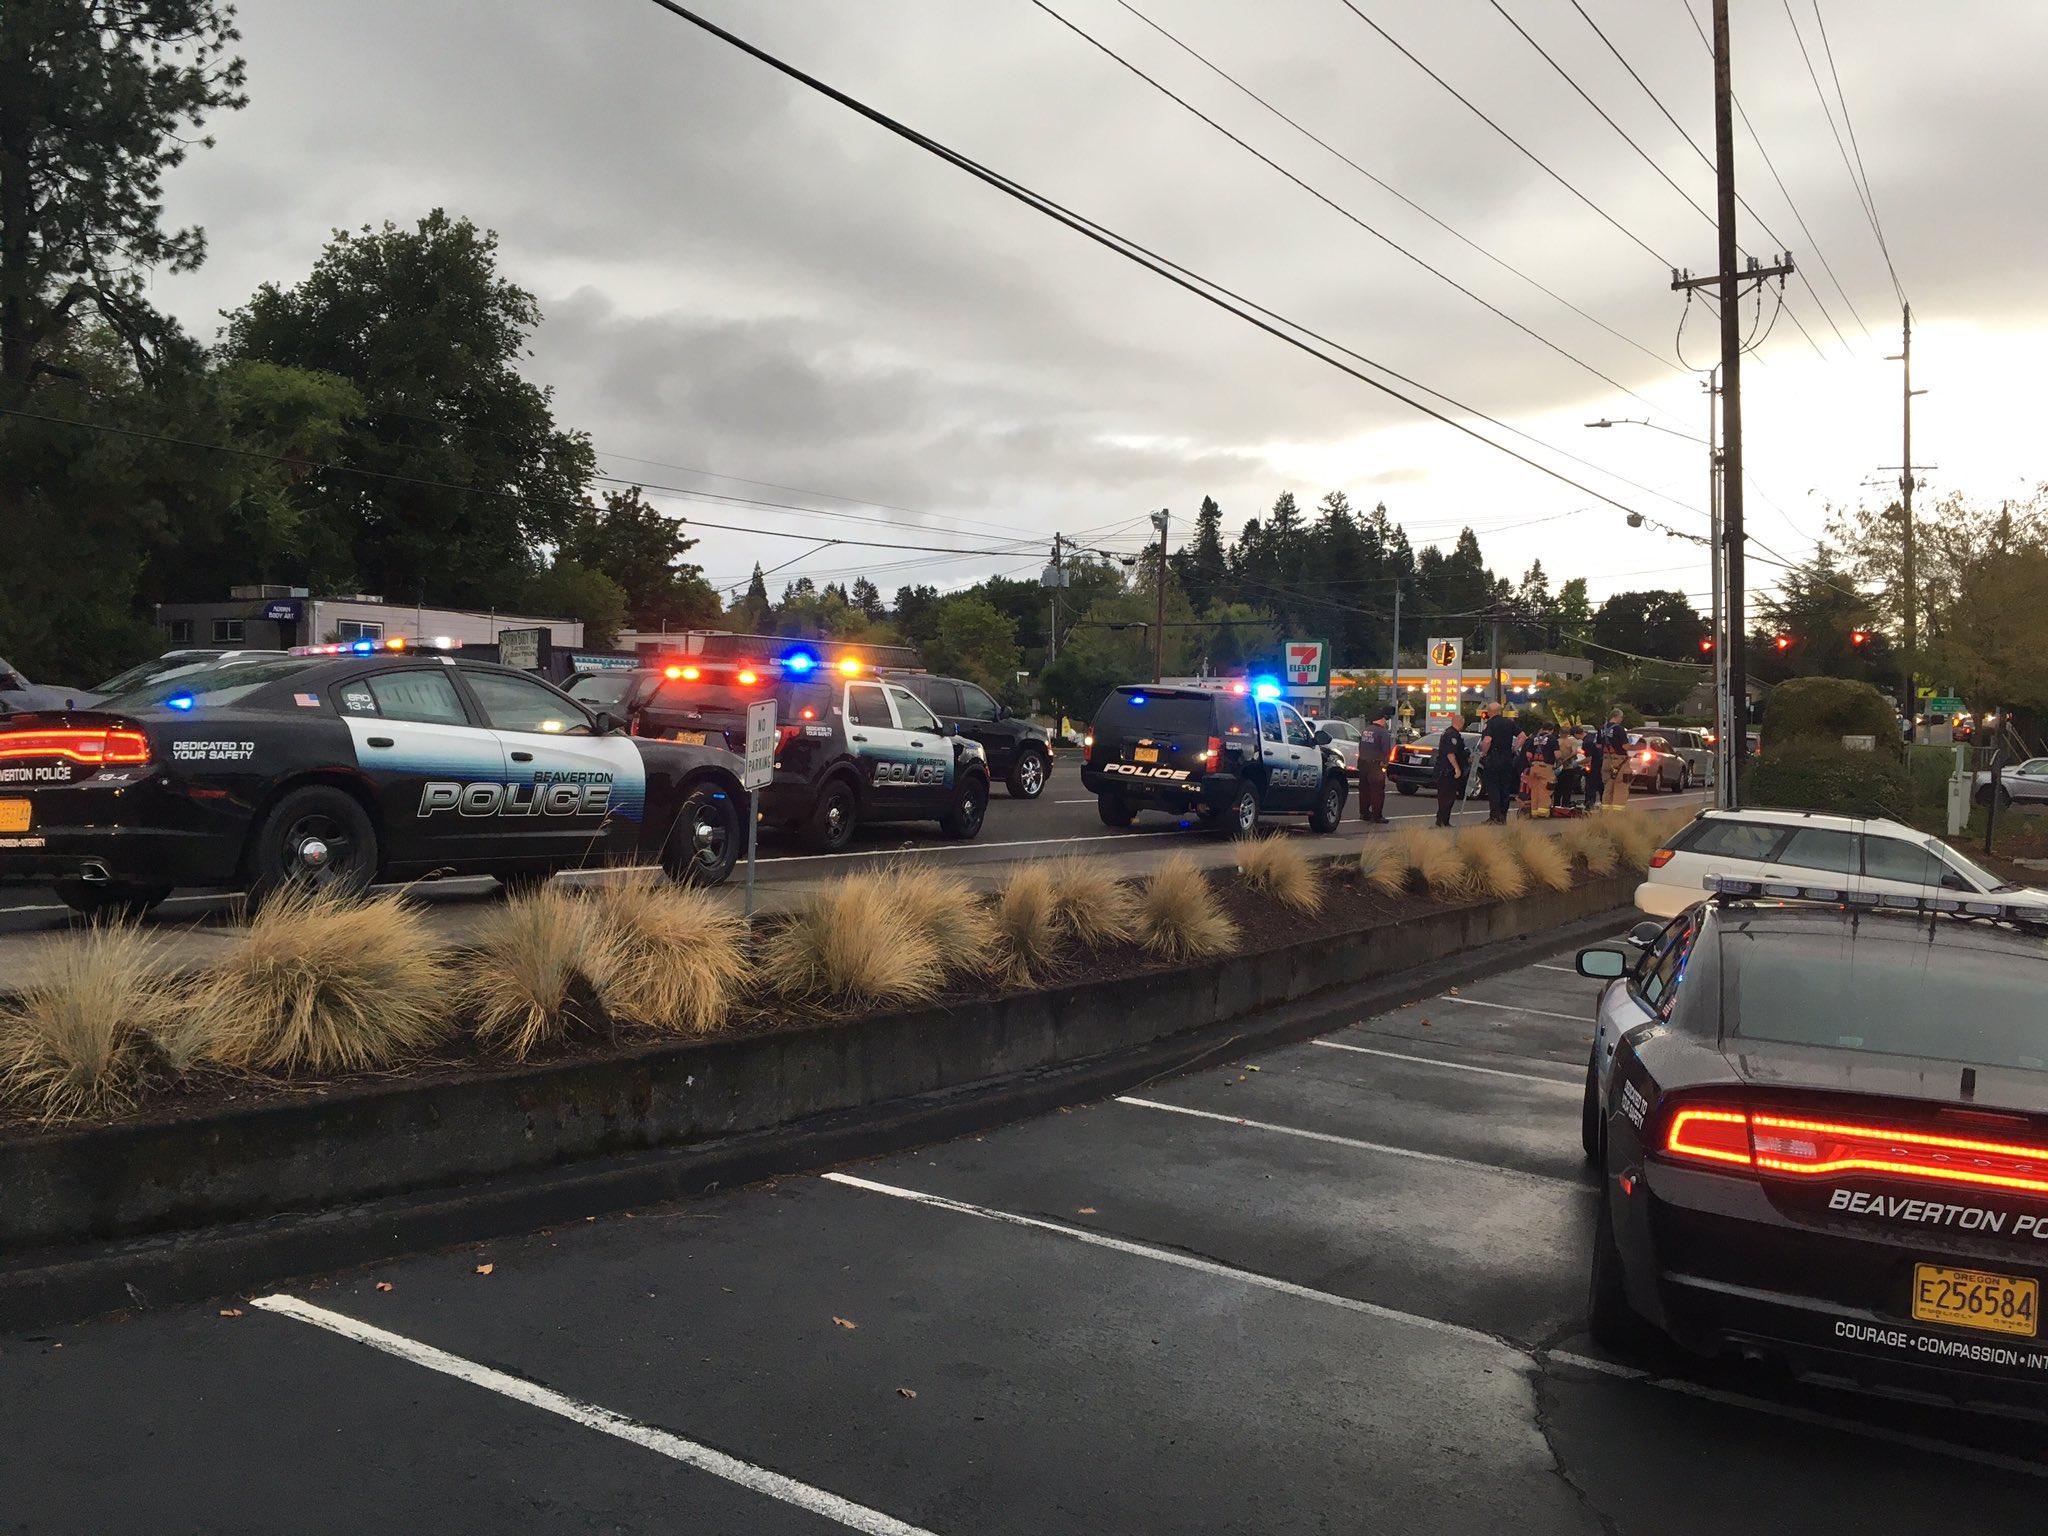 Photo: Beaverton Police